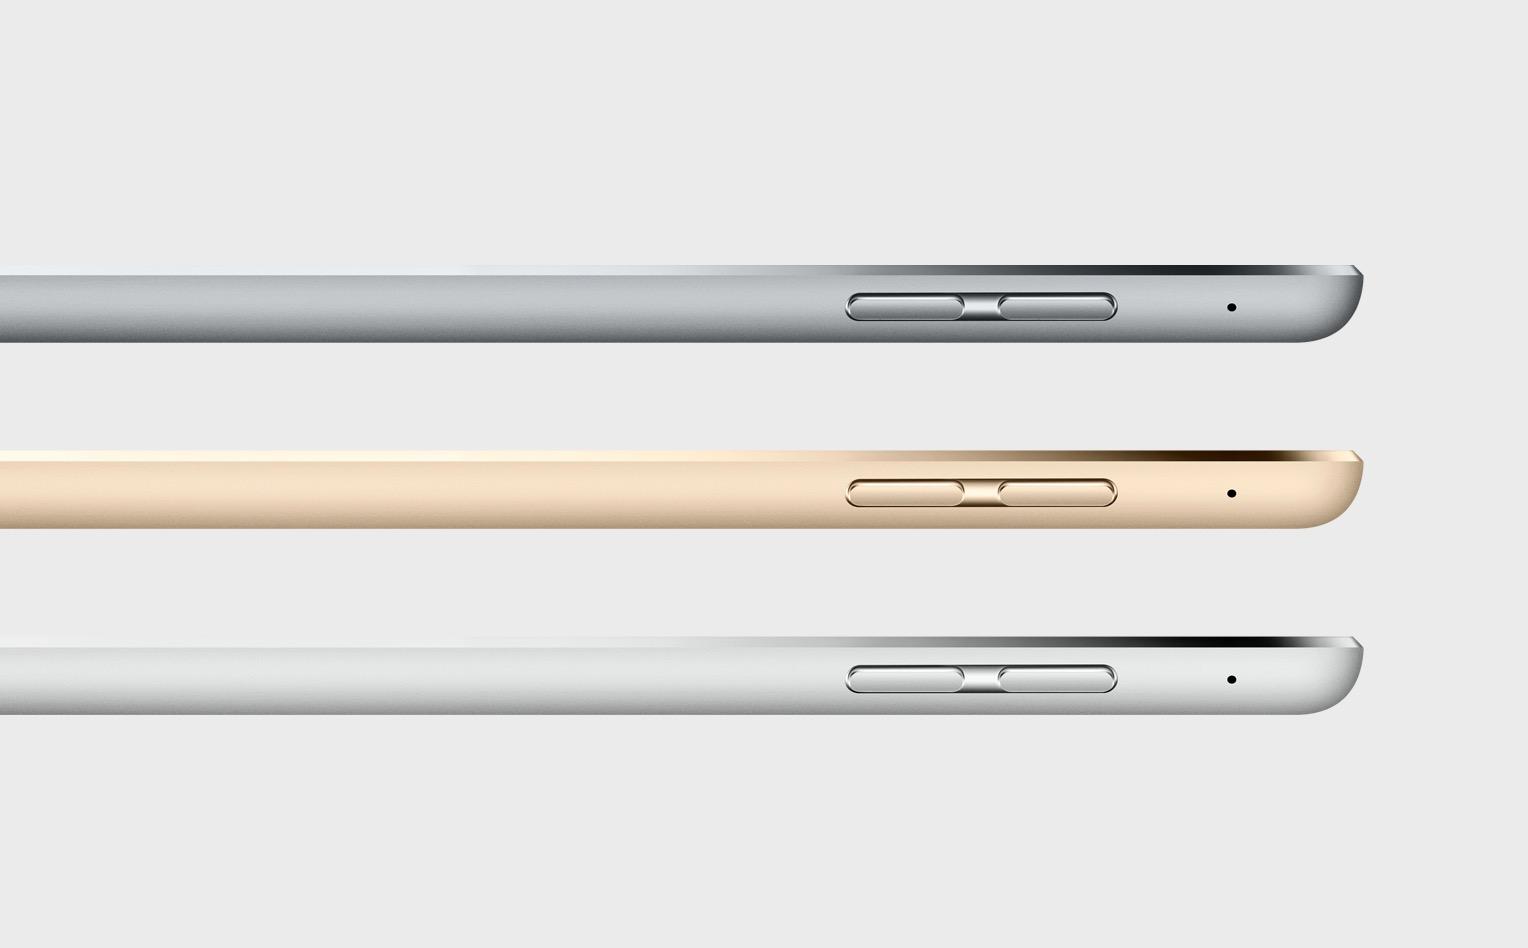 Dimensioni iPad Pro